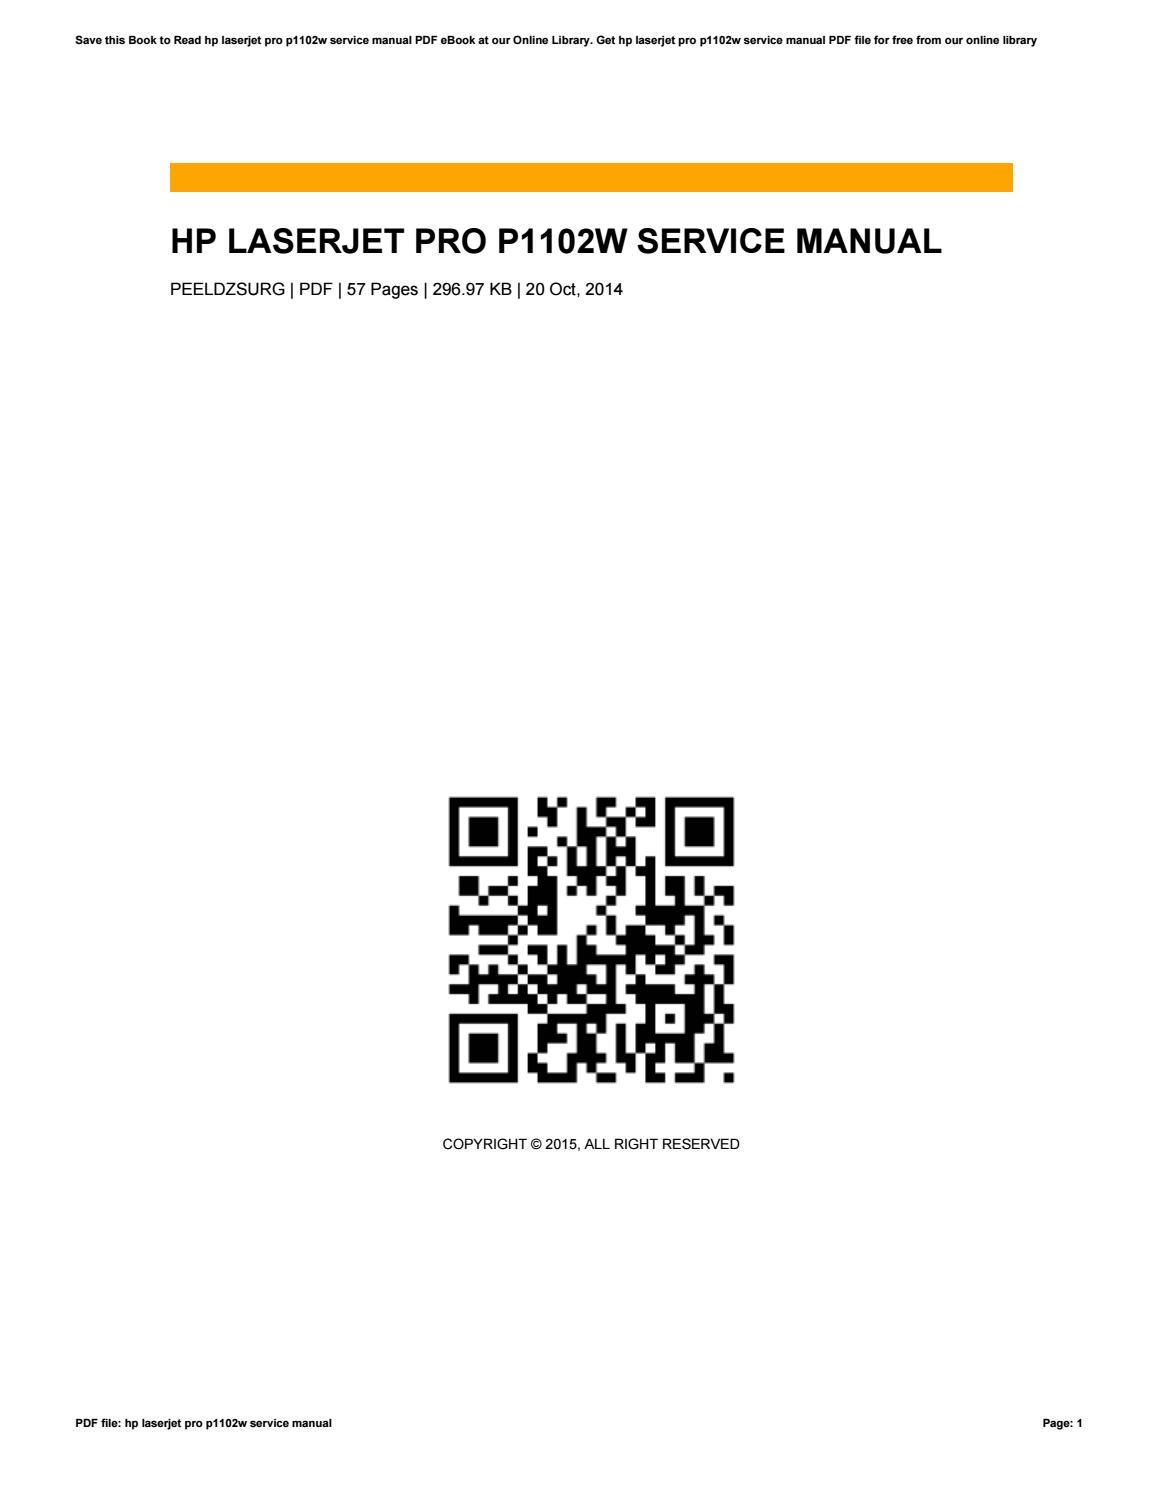 PDF  HP LaserJet Professional P1100 Series Printer - ENWW